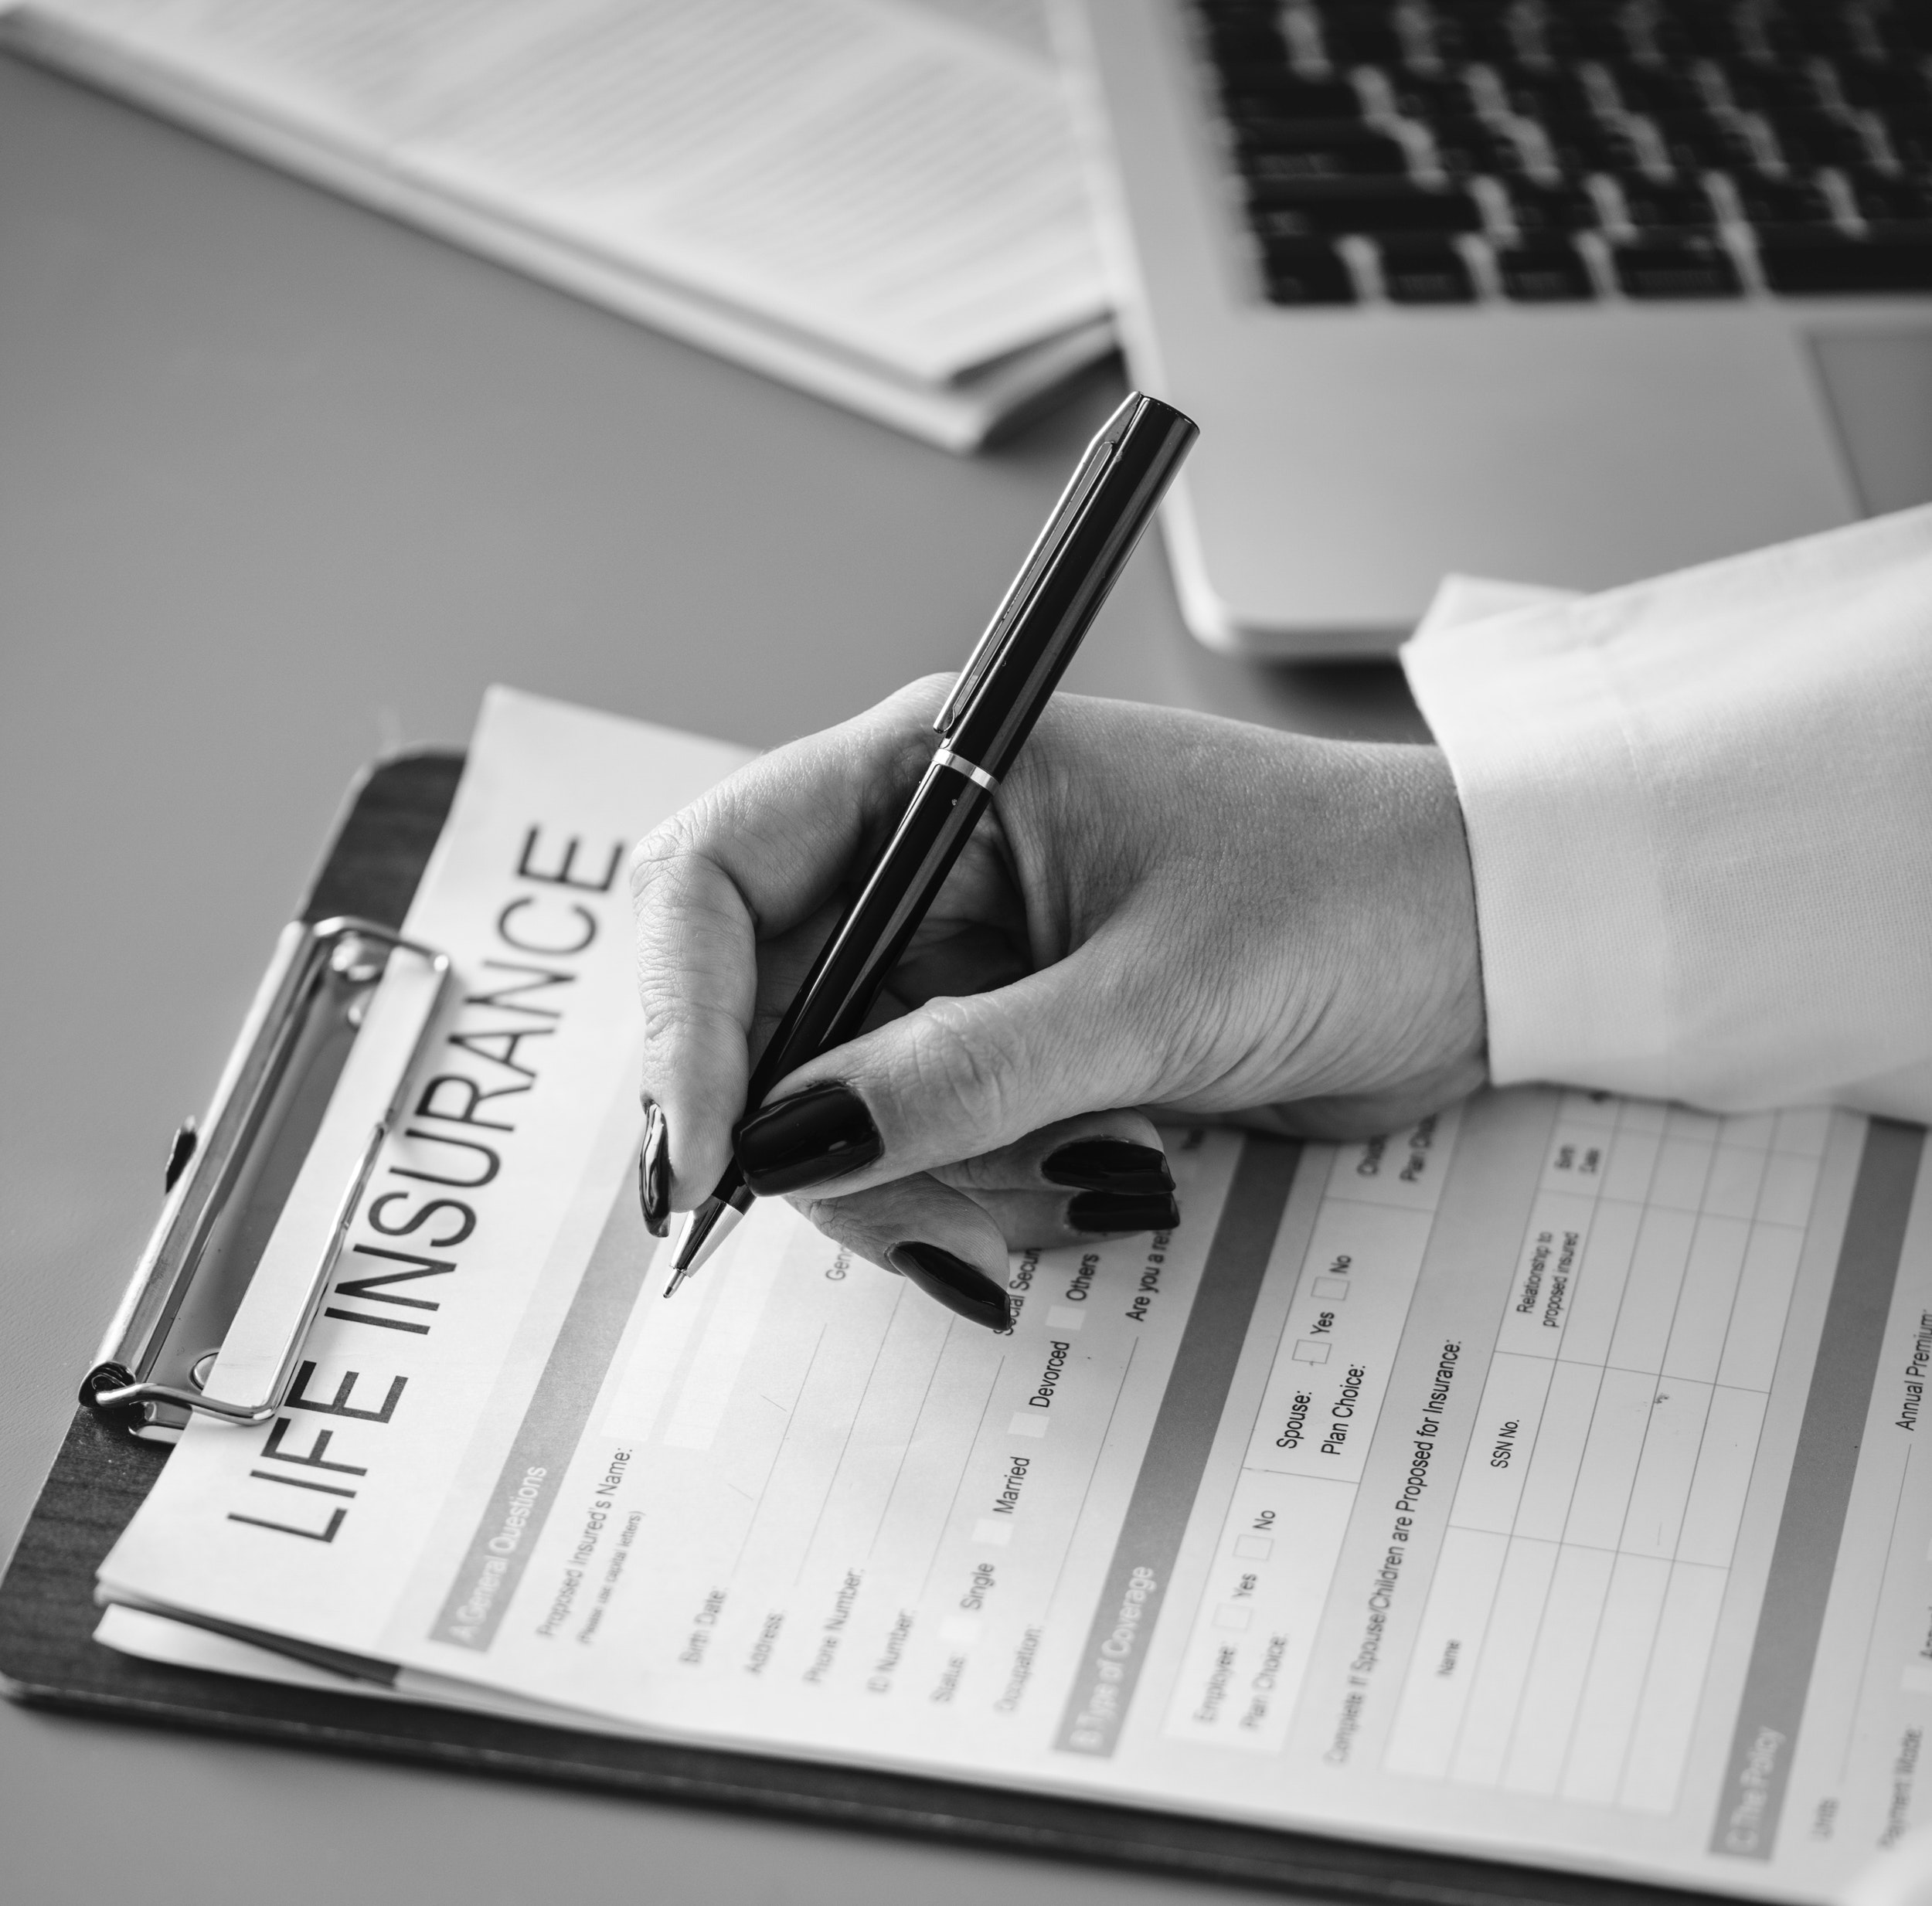 Employee Benefits Insurance, Risk Management, Captive Insurance Company, Employee Risk Management